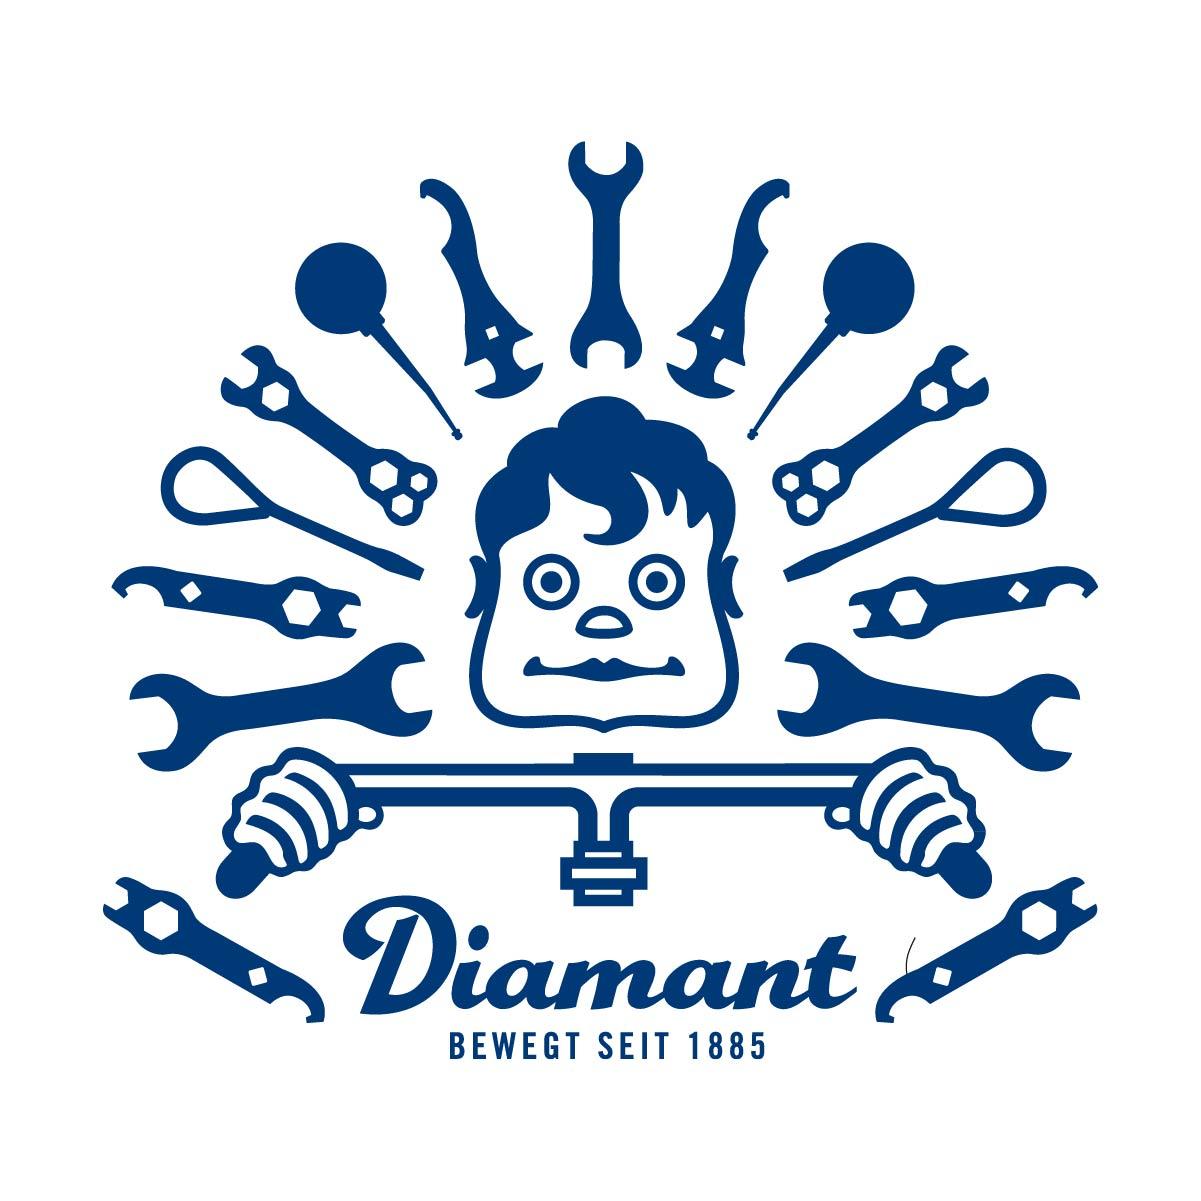 Logo Icon Diamant 99° Köpfchen Symbol Vektoren 99 Grad Illustration einfarbig